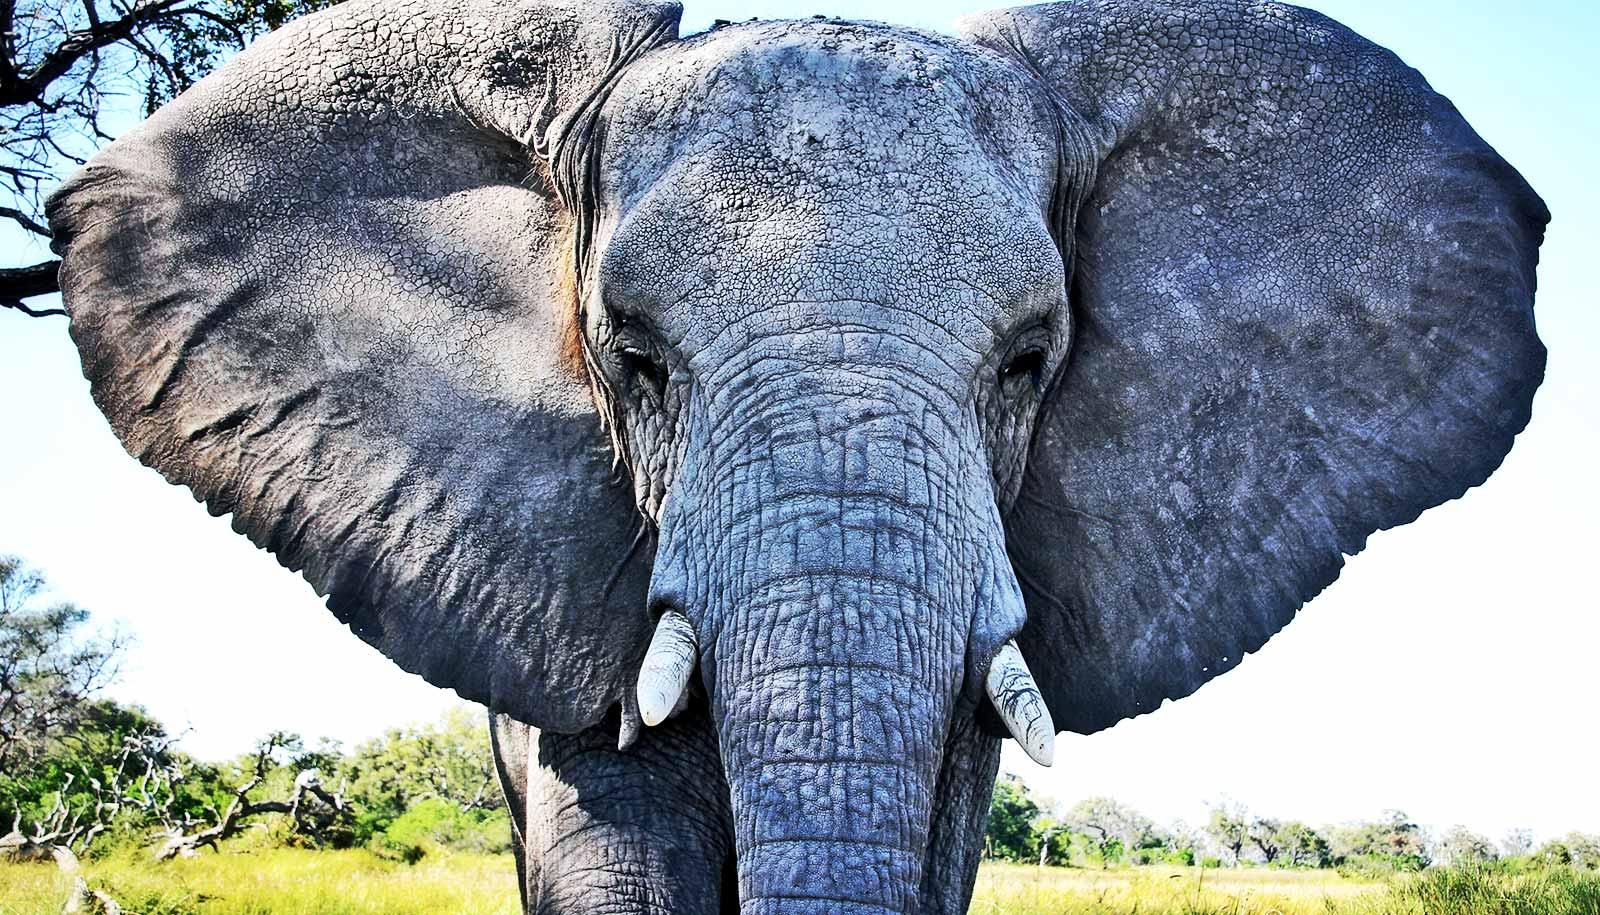 39 zombie 39 gene returns to life and kills cancer in elephants futurity - Image elephant ...